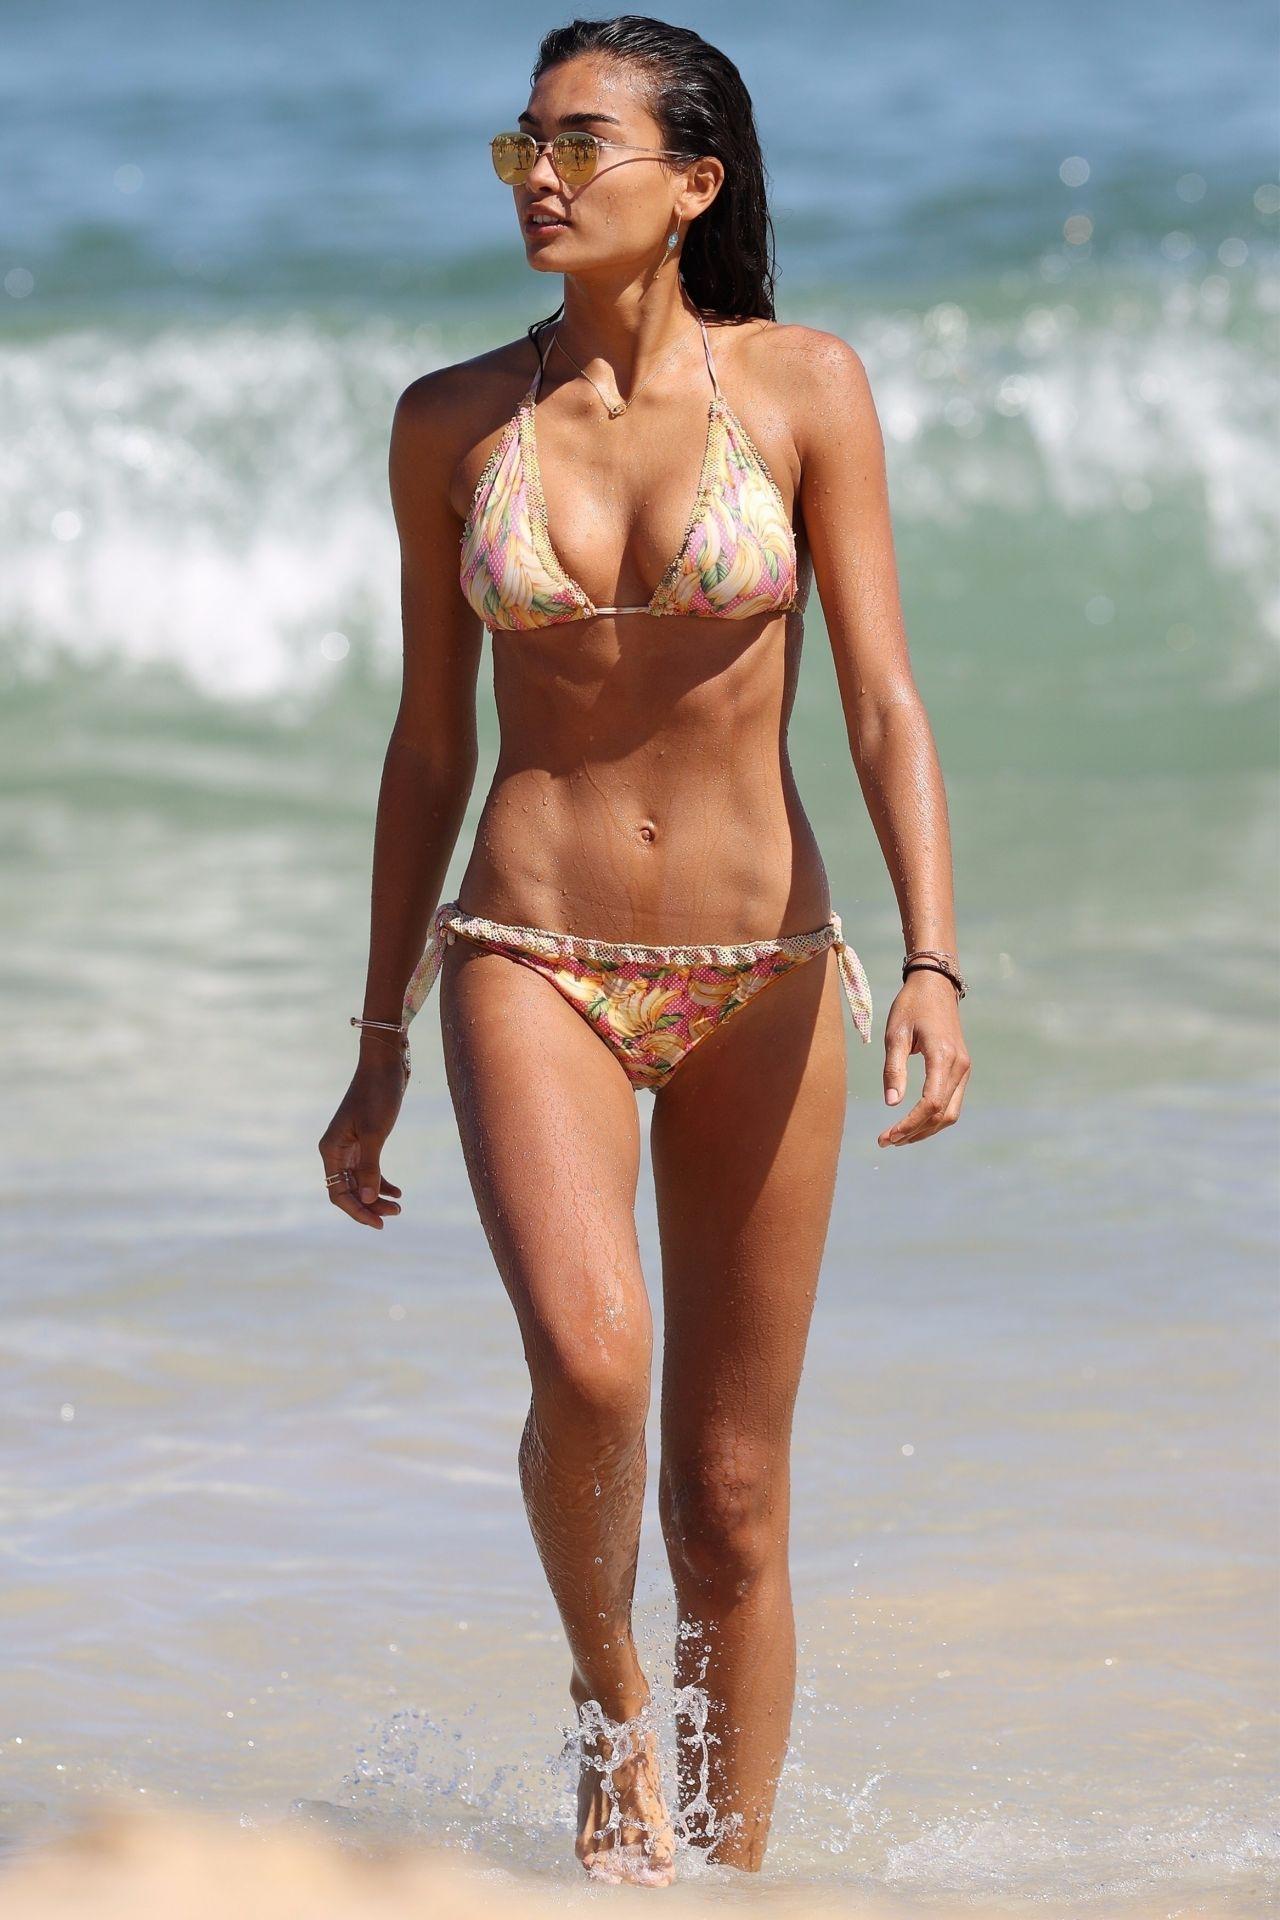 Kelly Gale in Bikini on Bondi Beach in Sydney Pic 1 of 35